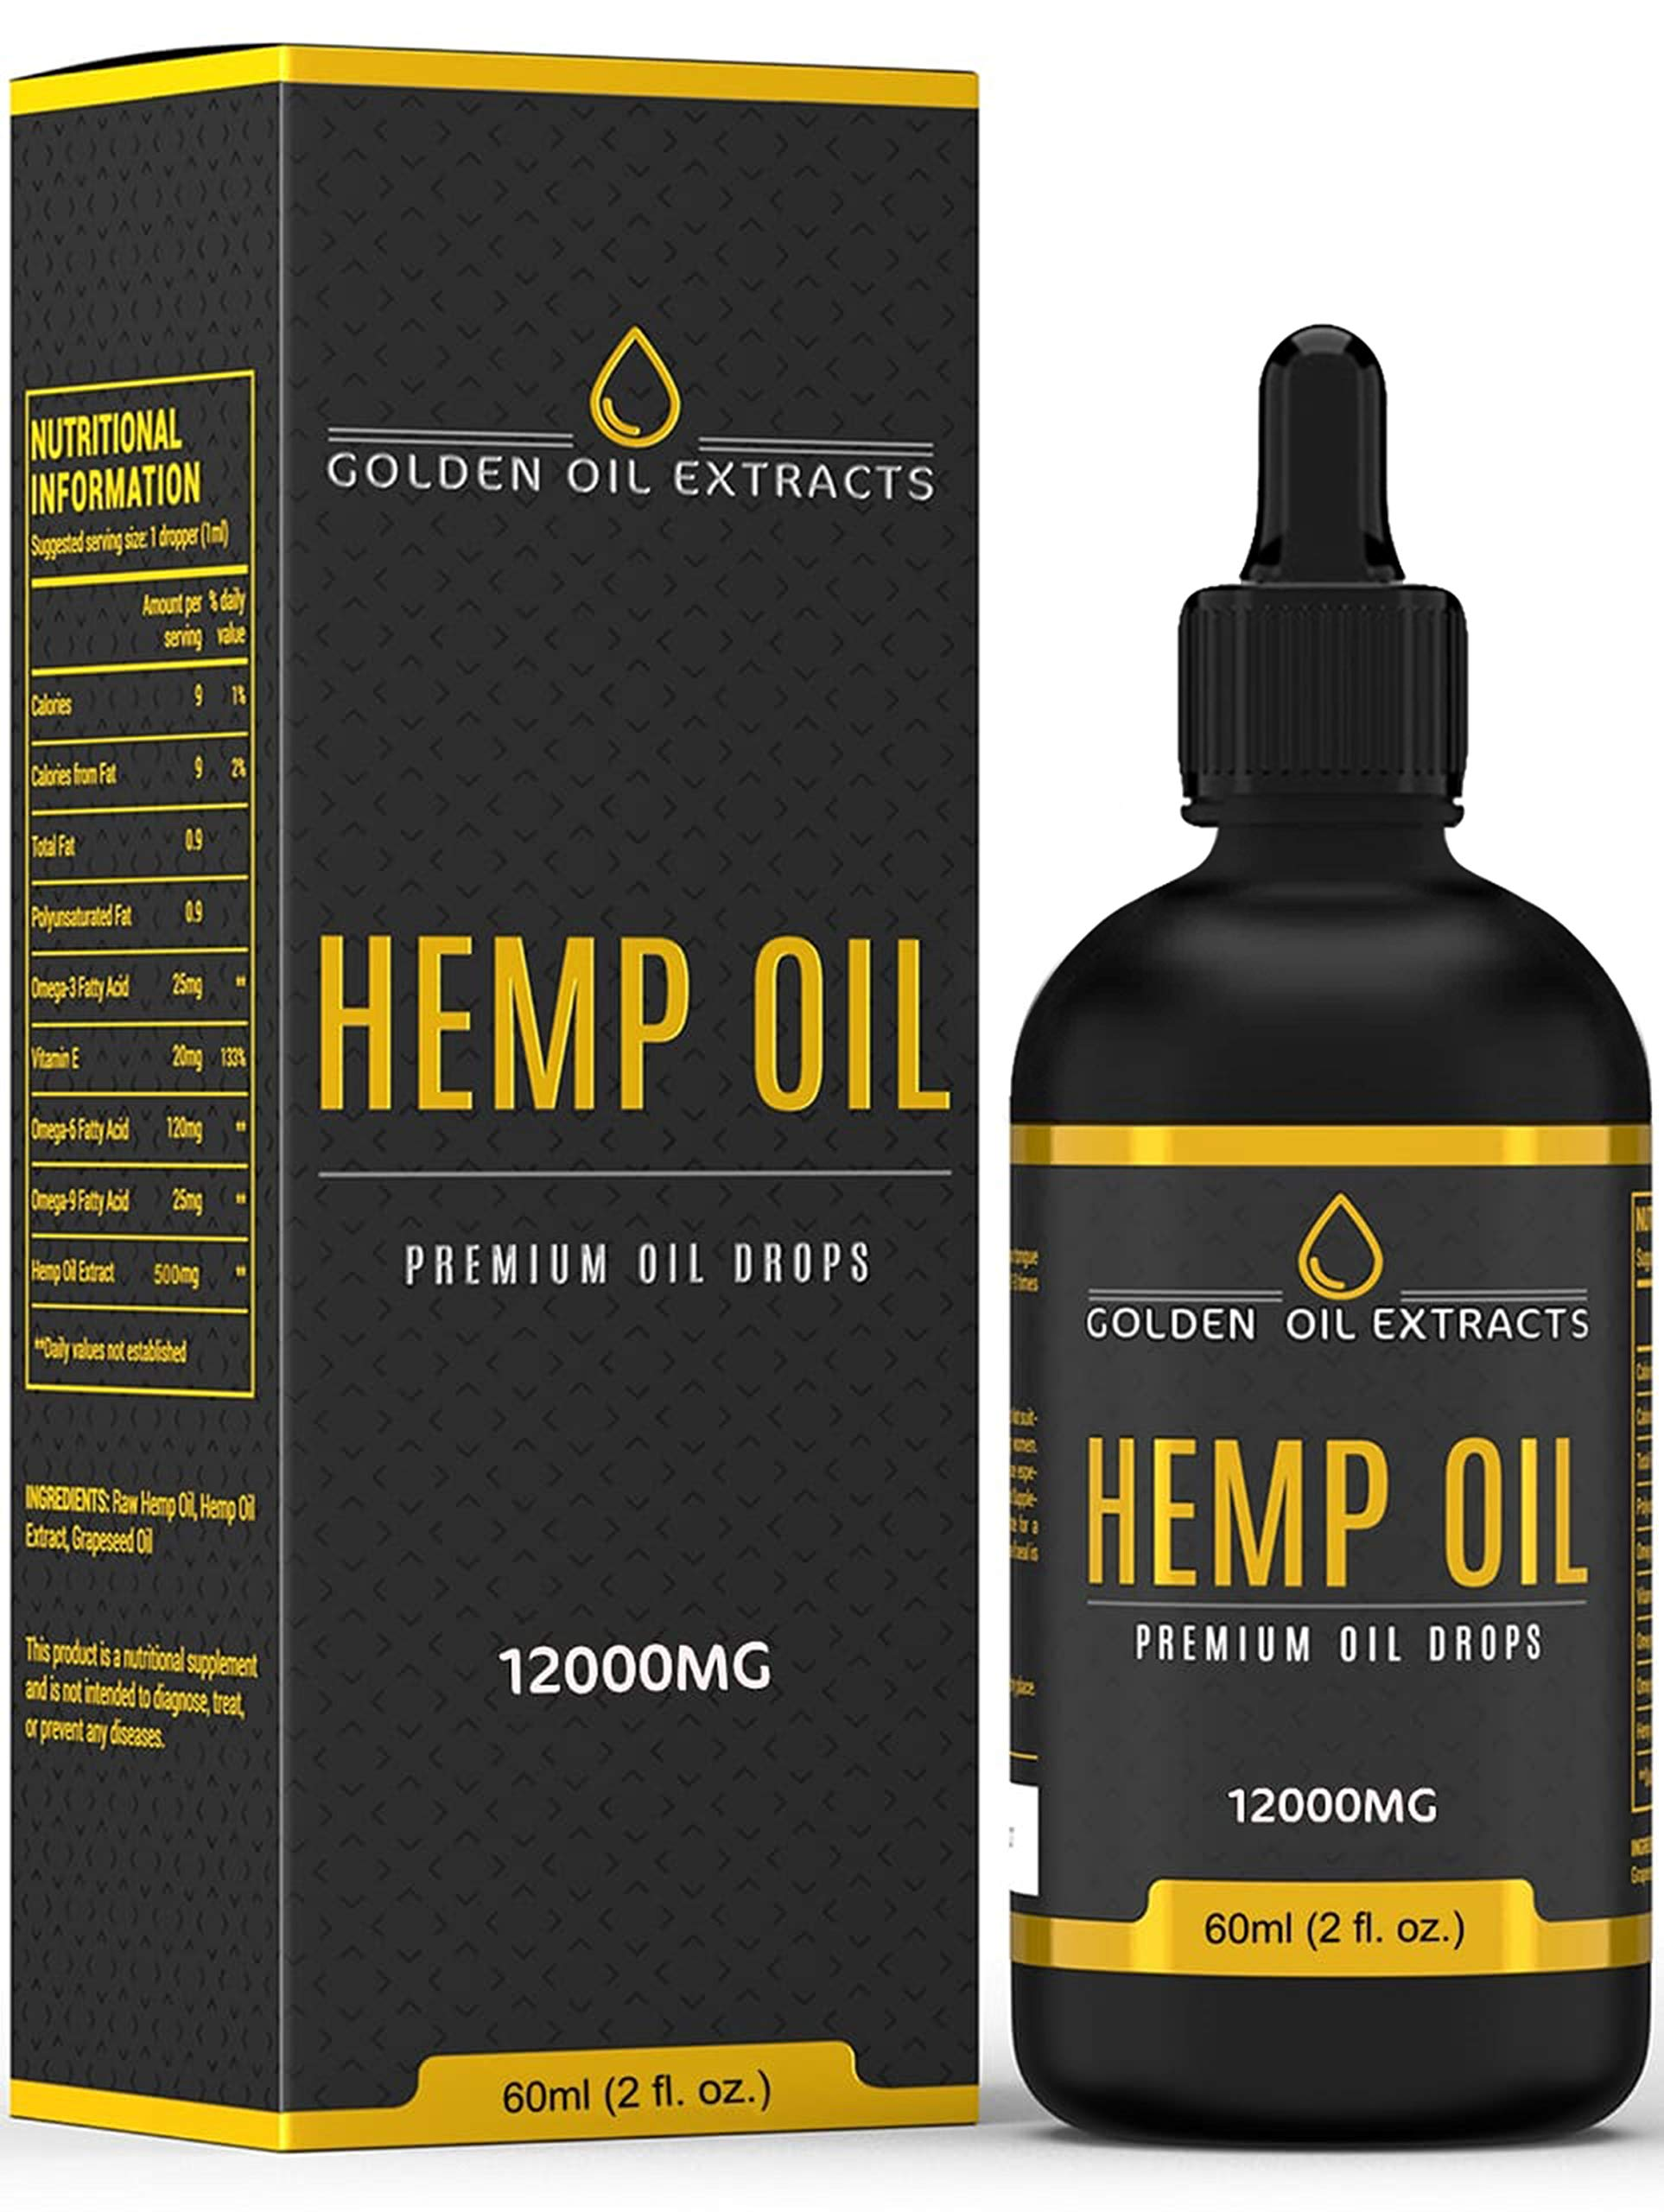 Golden Oil Extracts 12,000mg 60ml High Strength Liquid Hemp Oil Drops 60% Relief Omega 3